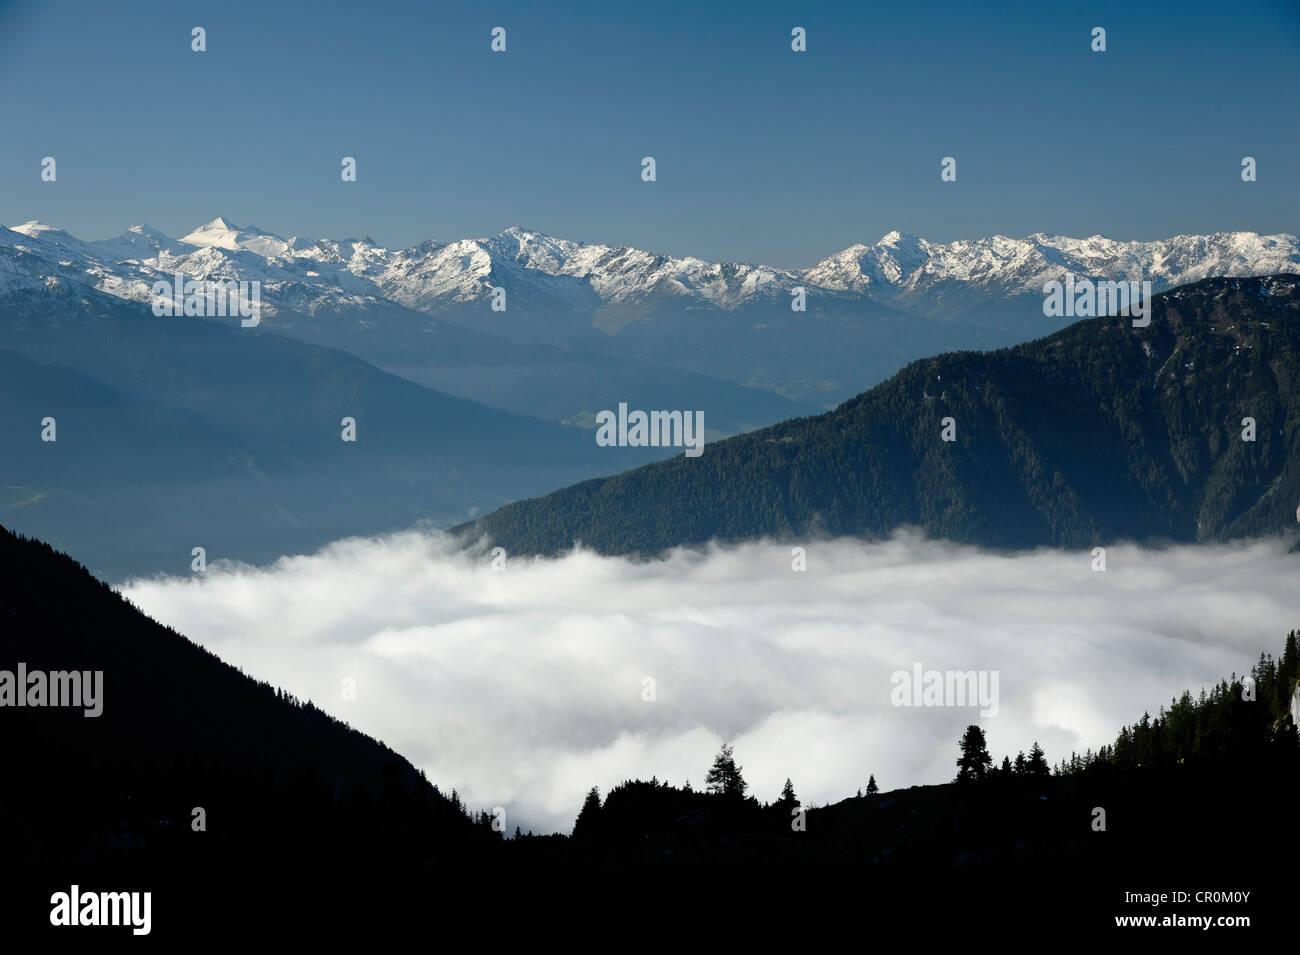 View from Erfurt alpine hut in the Rofan mountains onto the Karwendel mountains, Austria, Europe - Stock Image